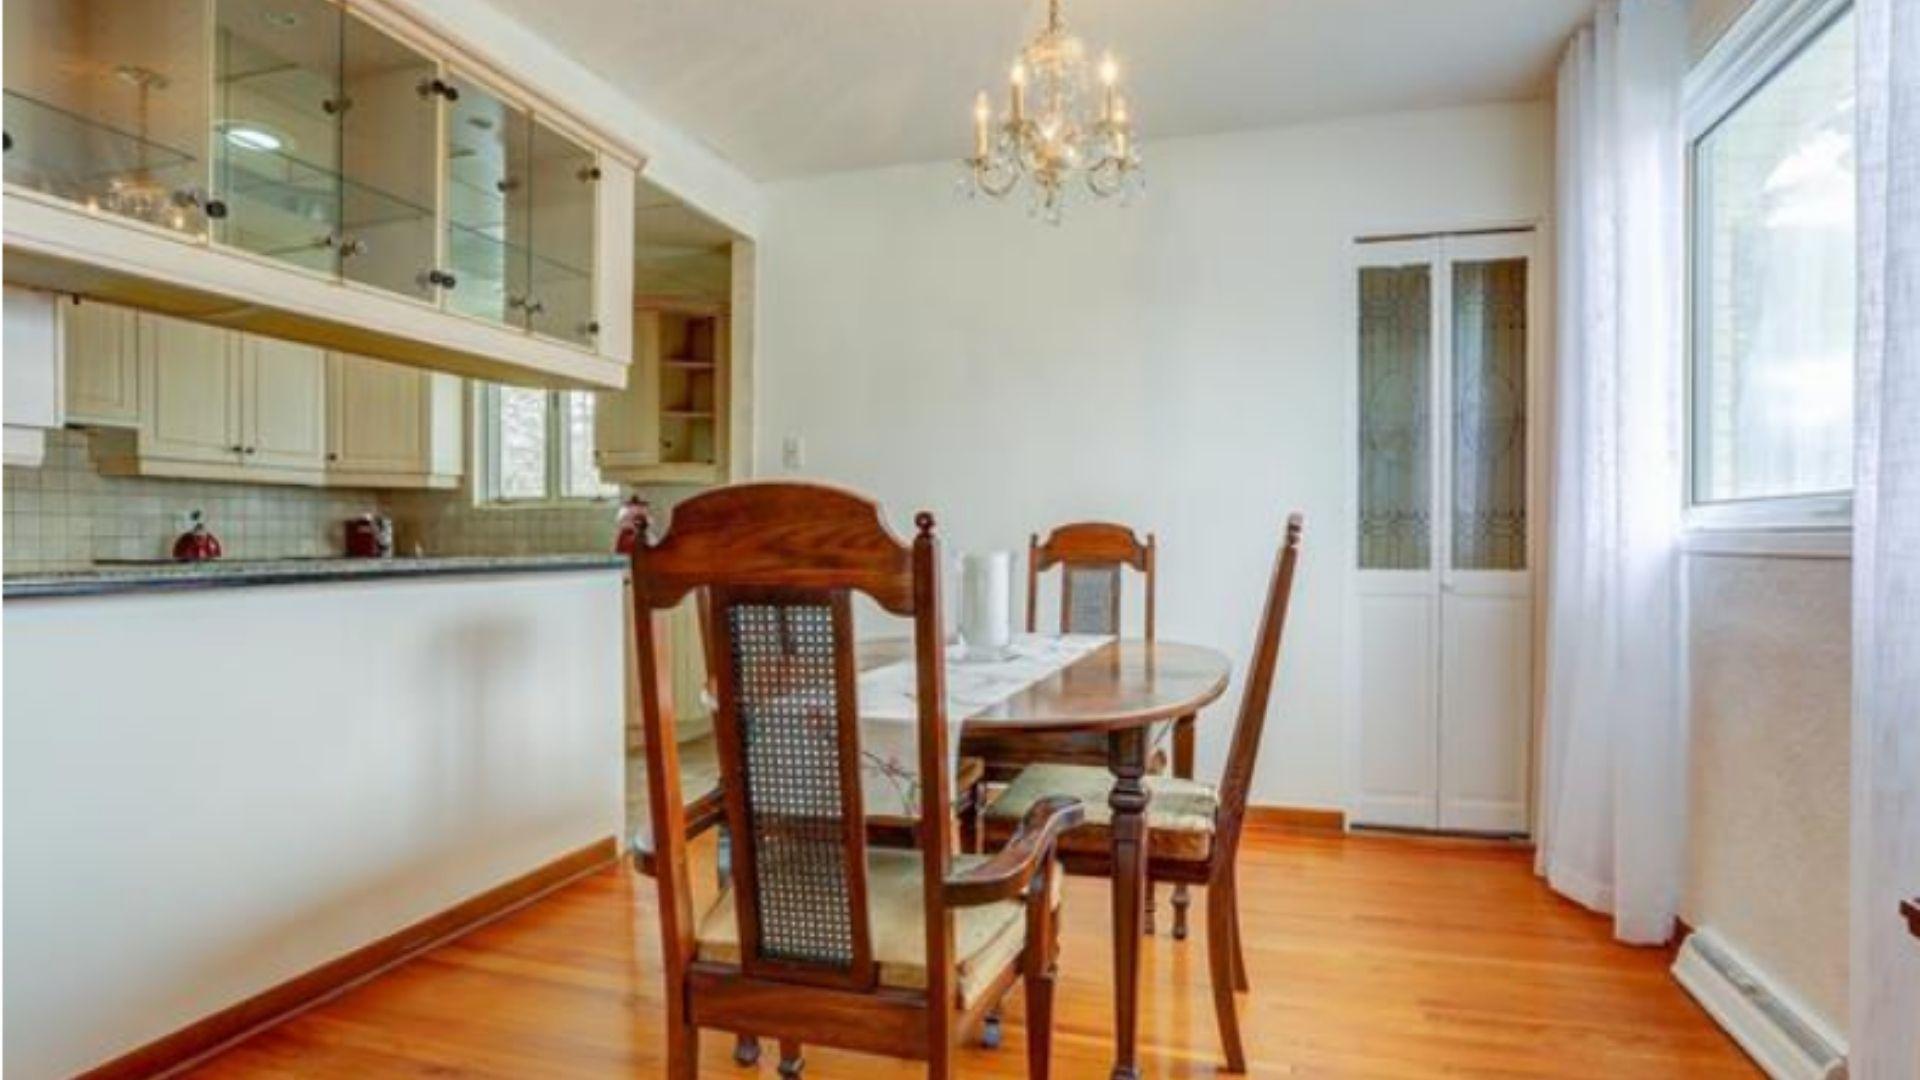 Pierrefonds kitchen renovation before